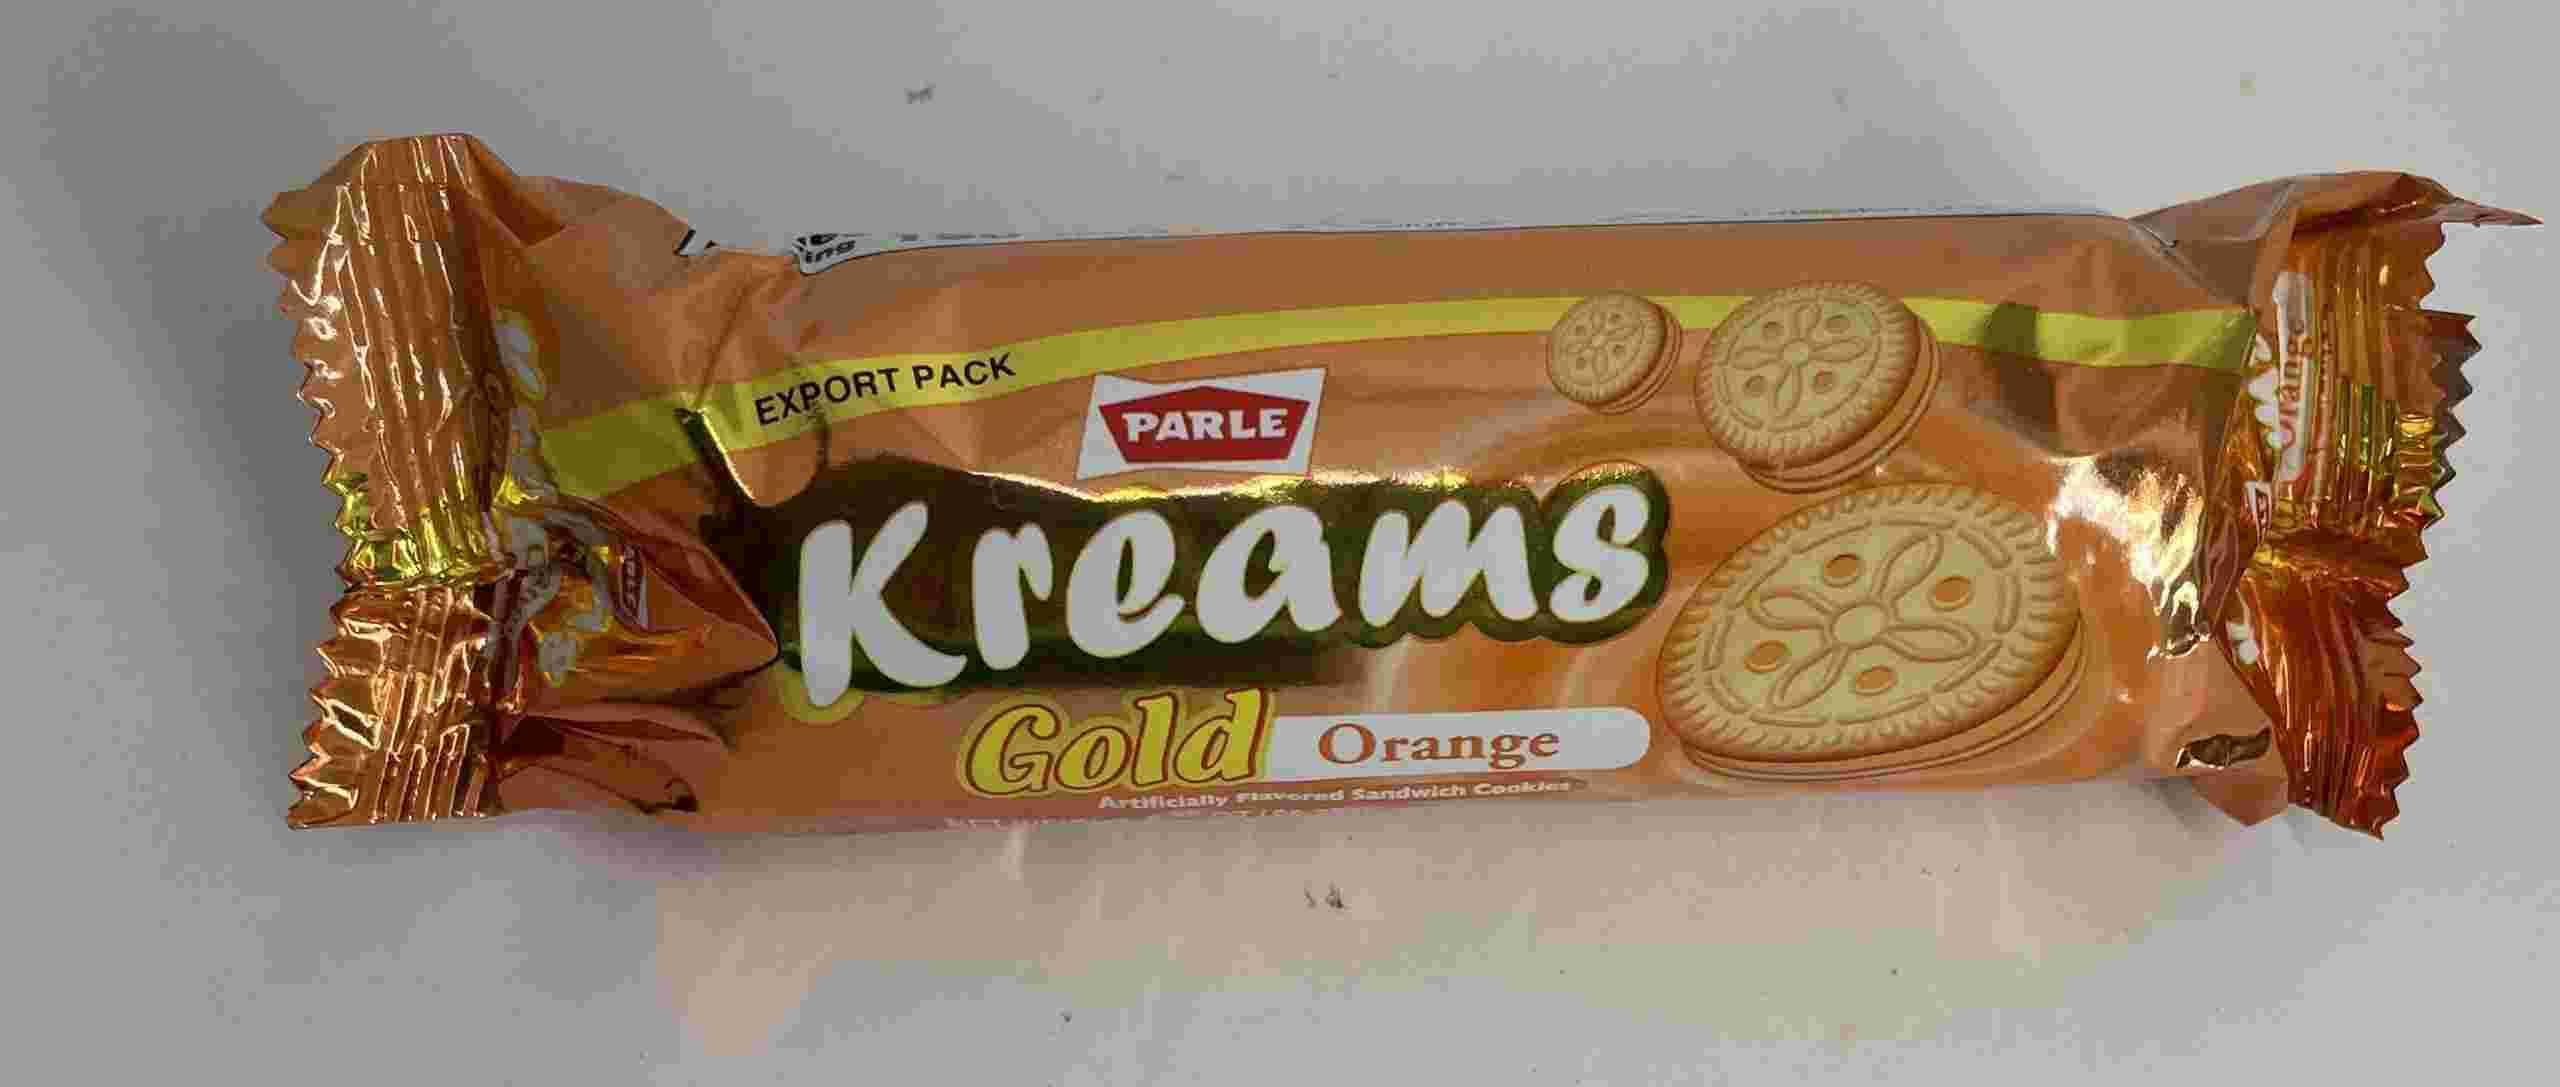 Parle Kreams Gold Orange